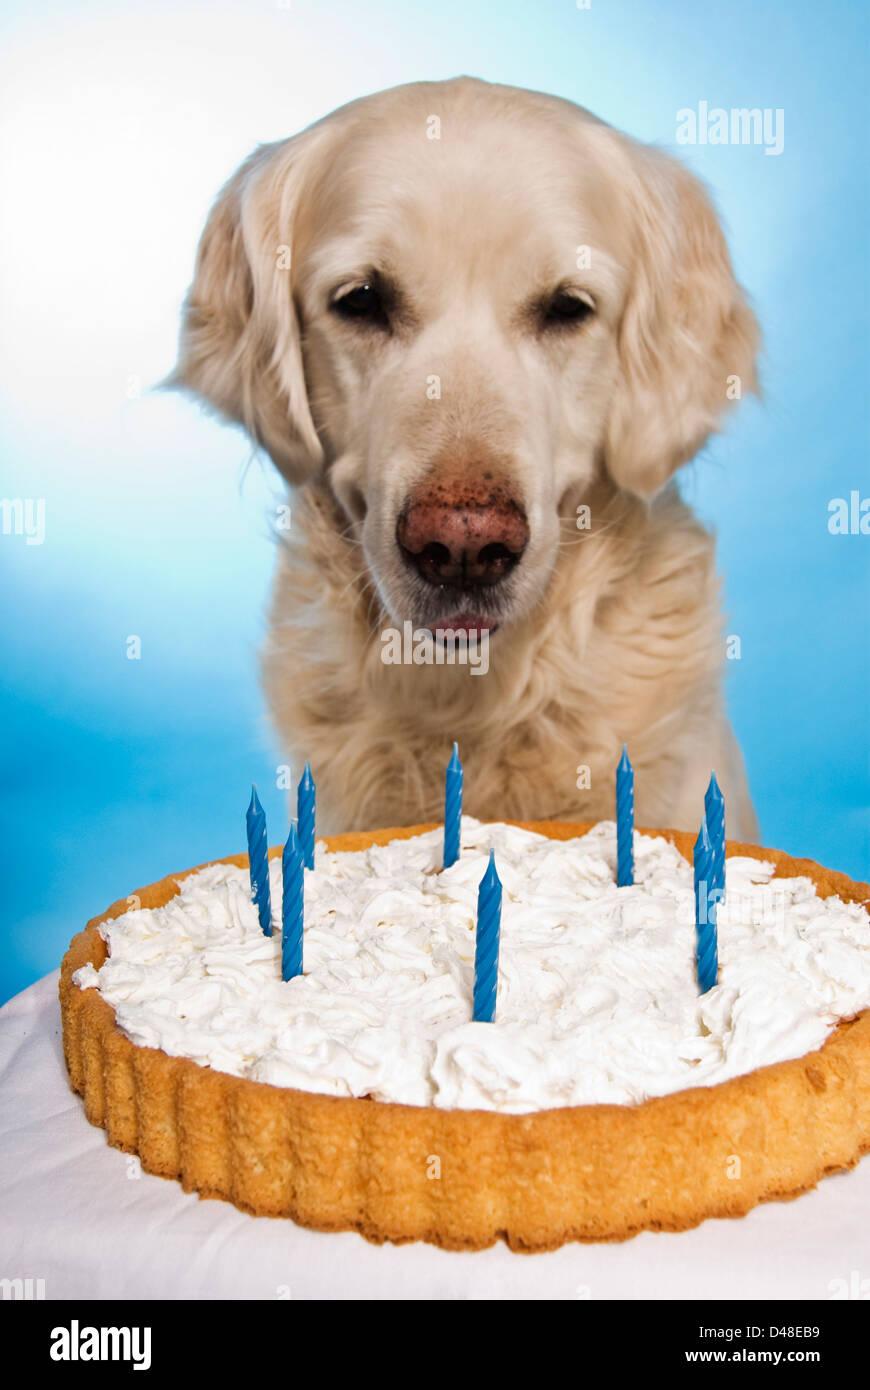 Phenomenal Golden Retriever Dog With A Birthday Cake Stock Photo 54276637 Funny Birthday Cards Online Alyptdamsfinfo